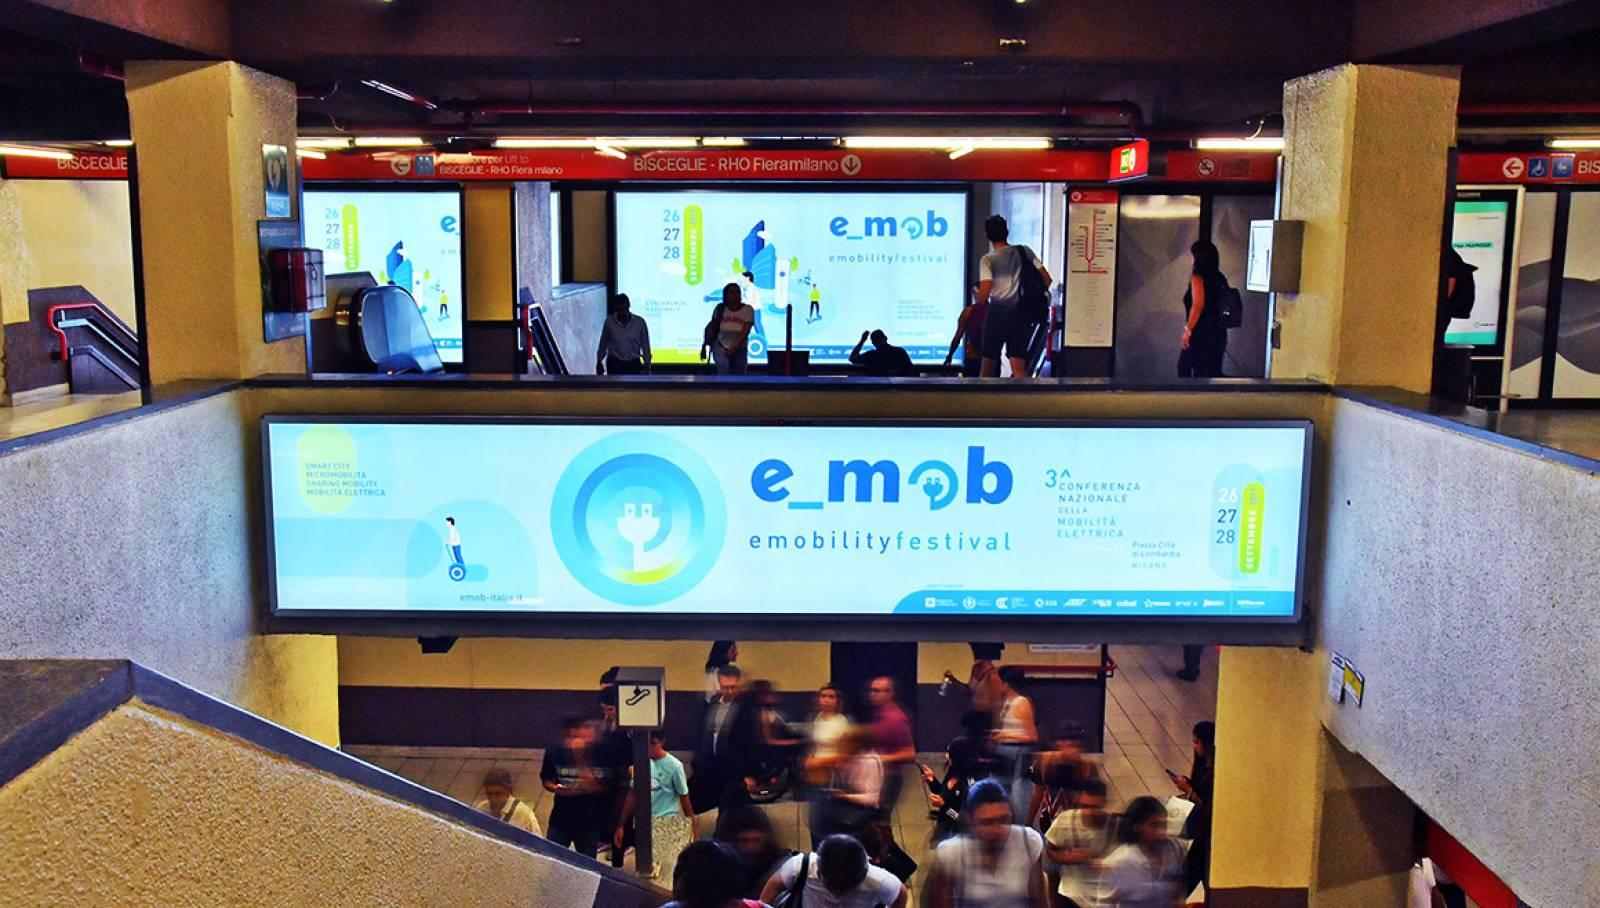 IGPDecaux Station Domination Milan Festival E-mob